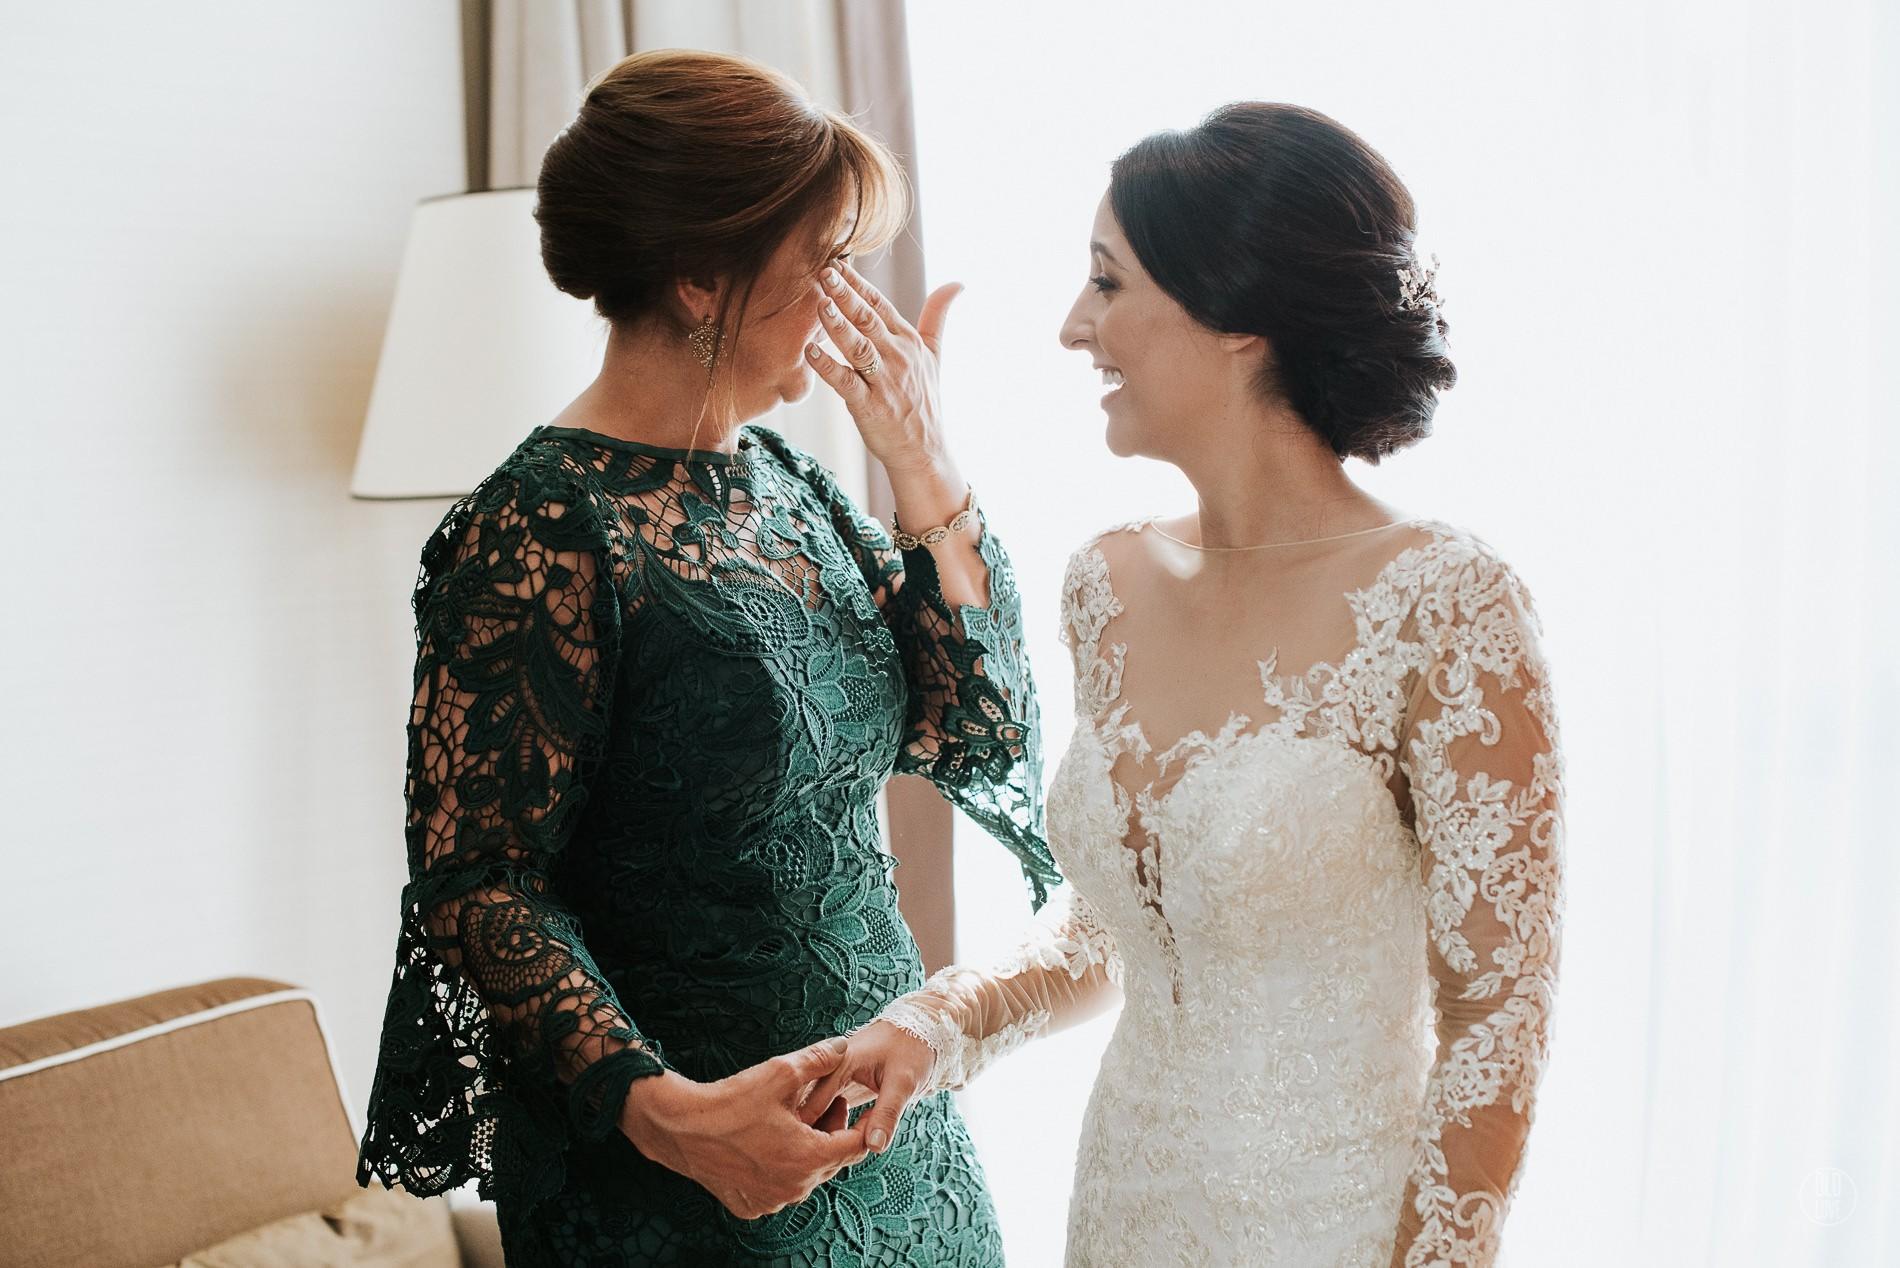 beleza da mãe da noiva e do noivo